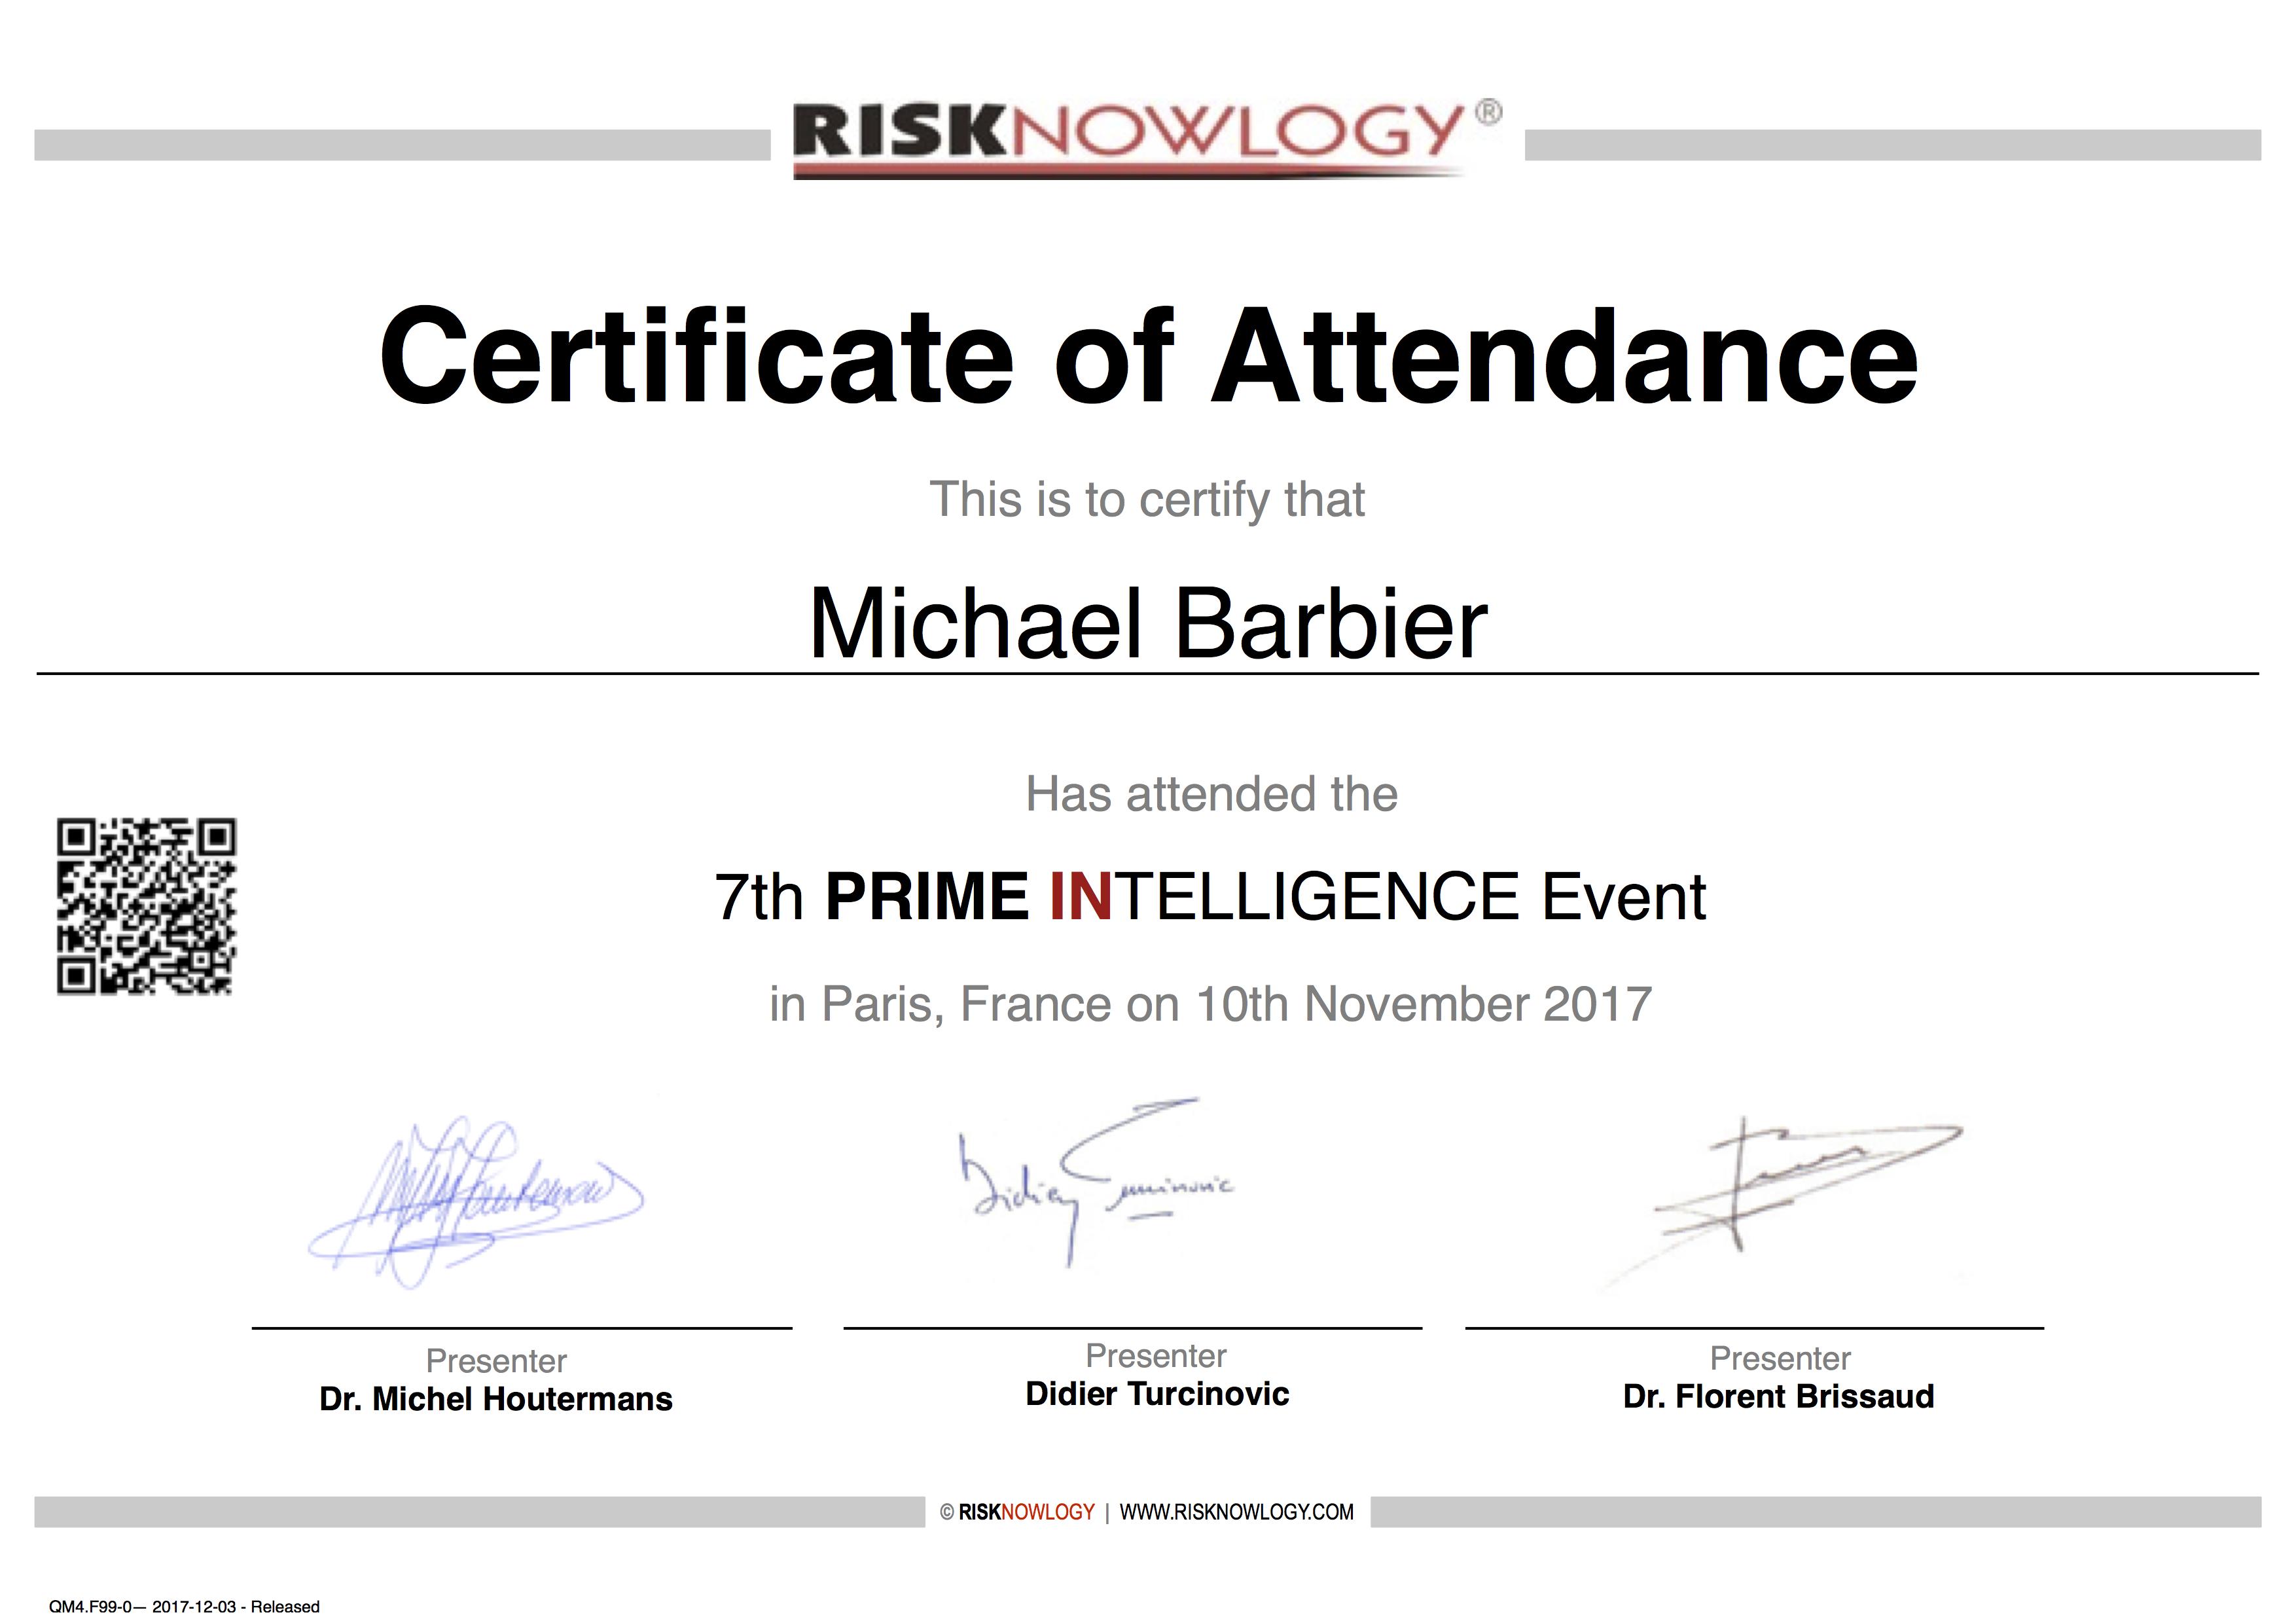 Safety Passport Of Michael Barbier